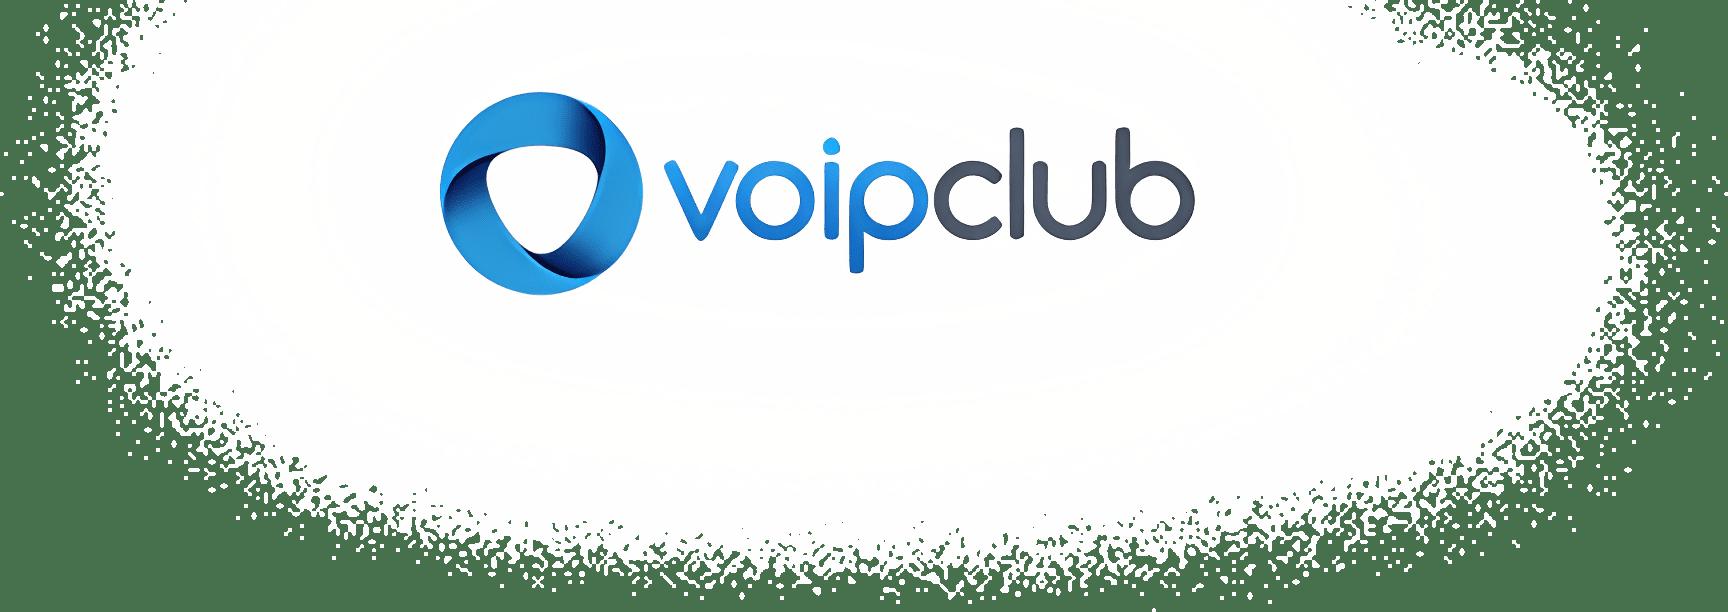 voipclub